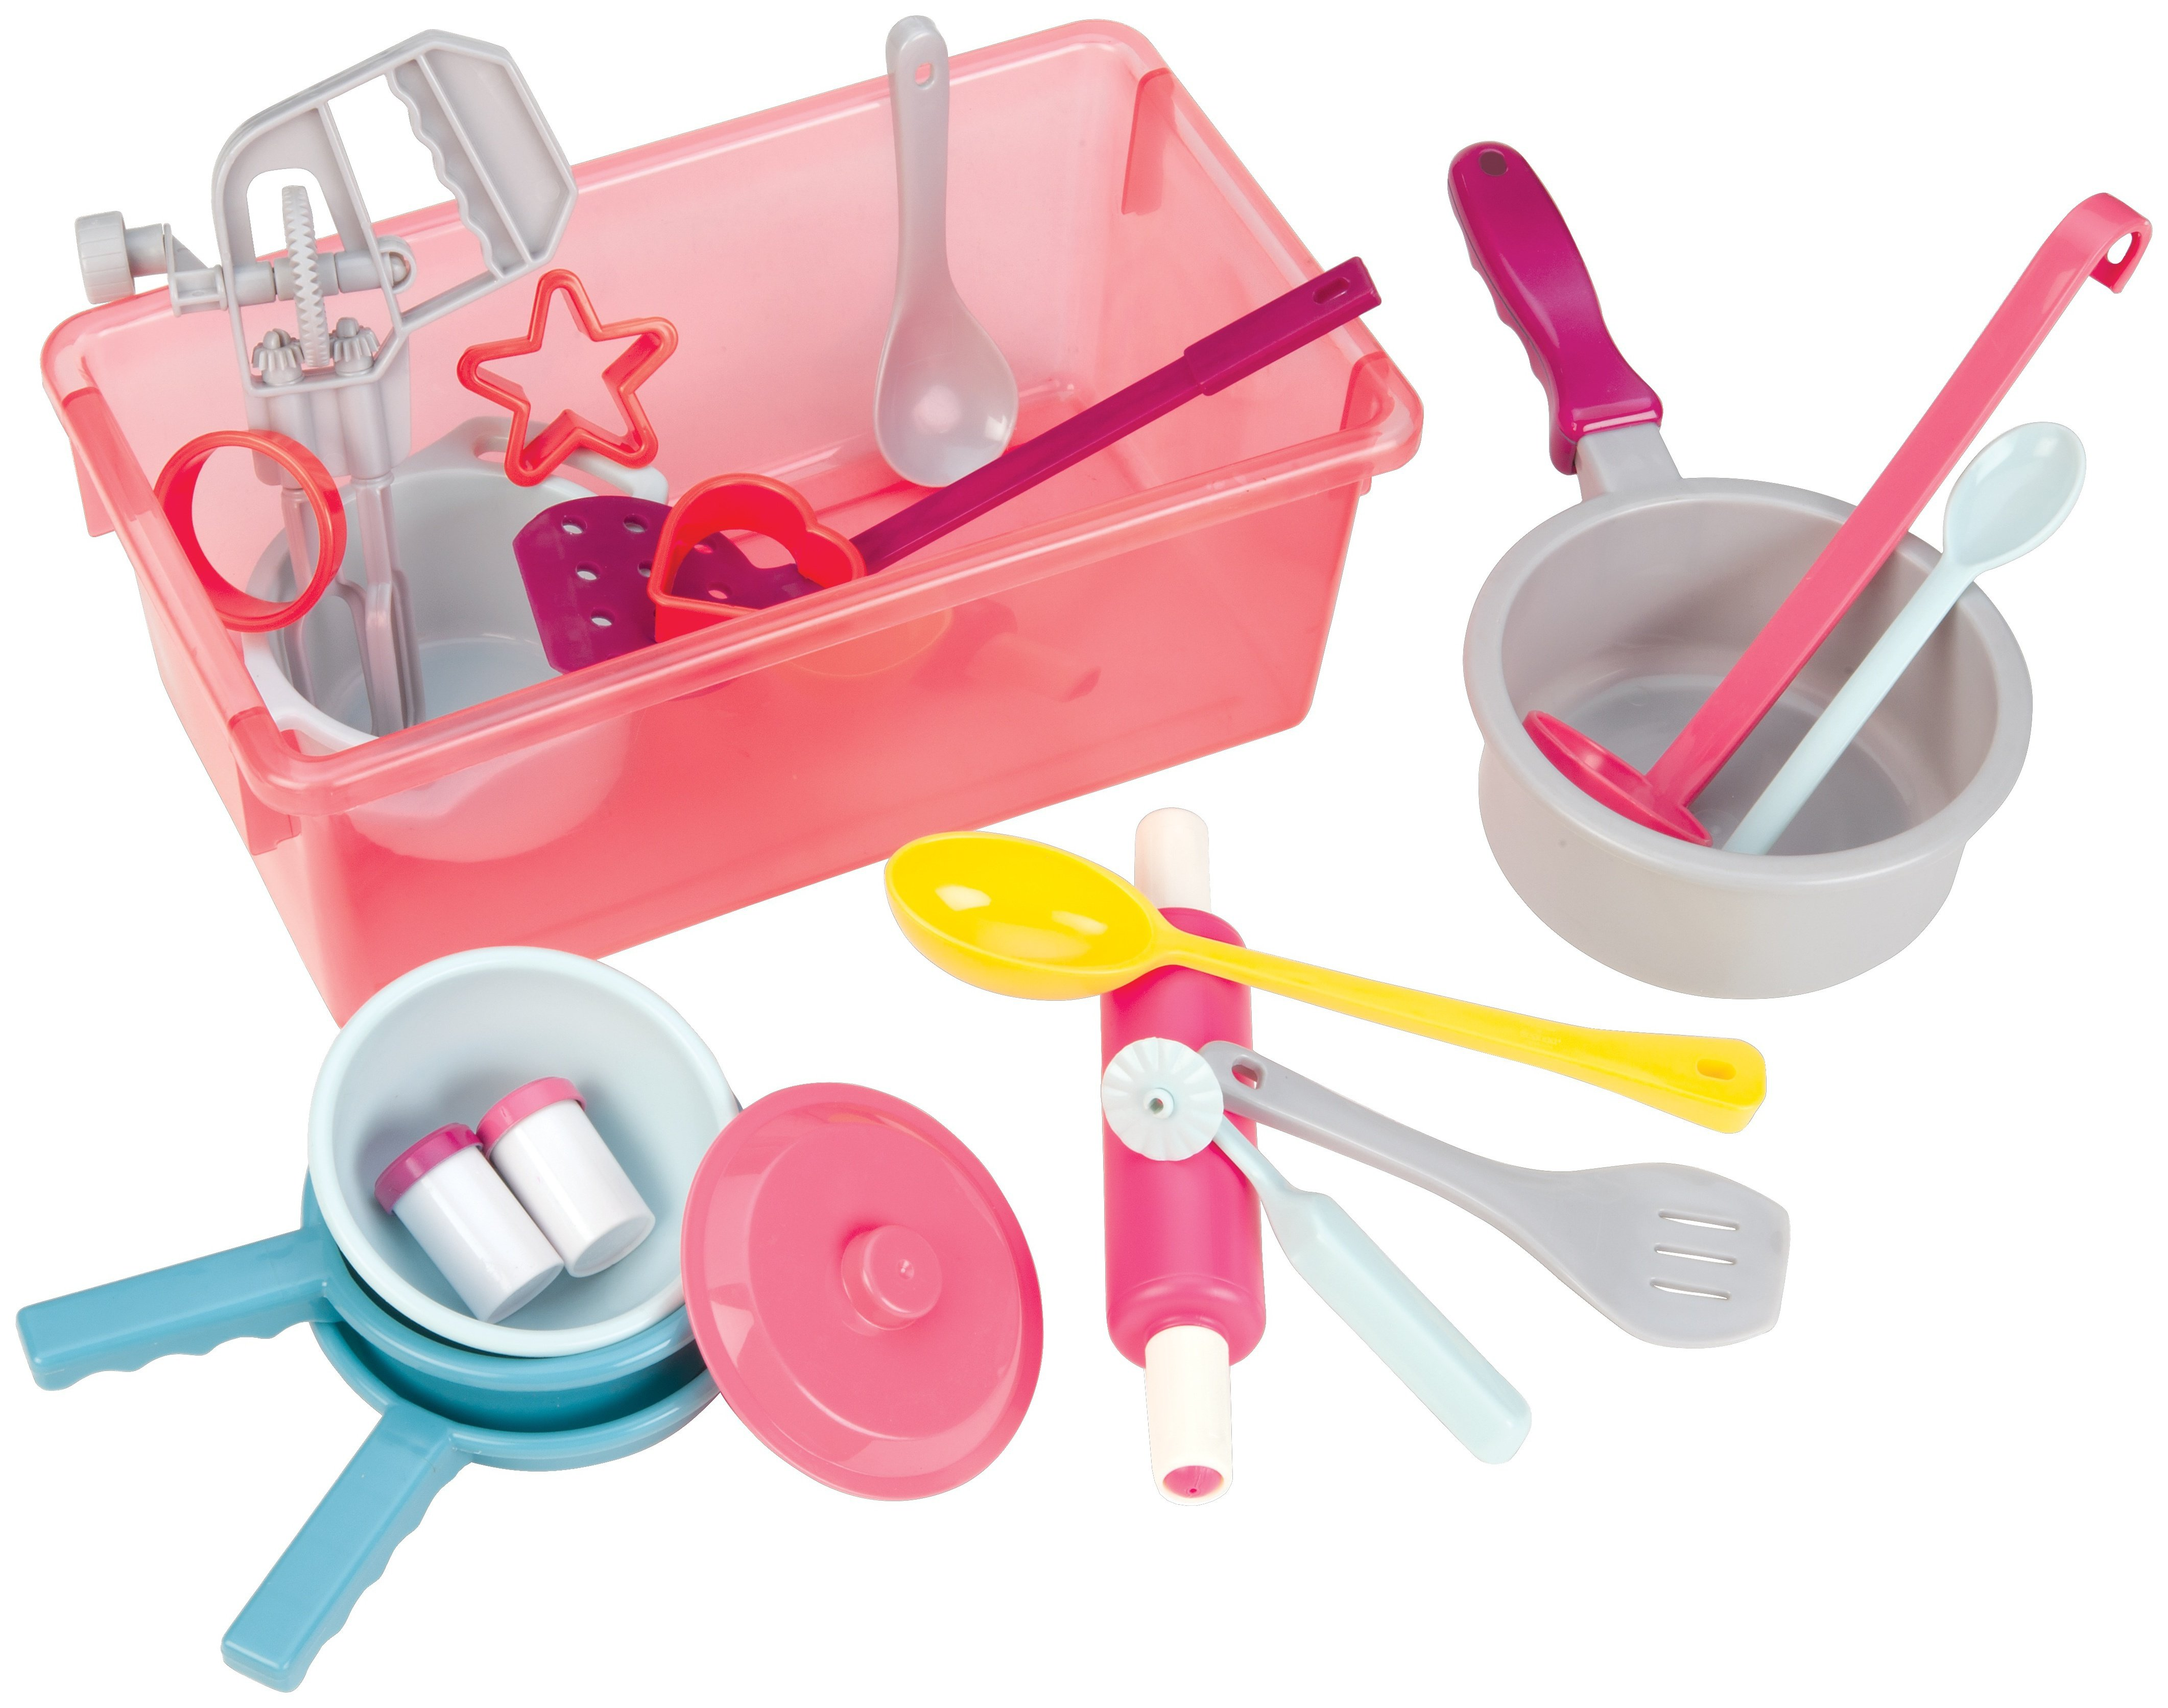 Image of Battat - Cooking Set